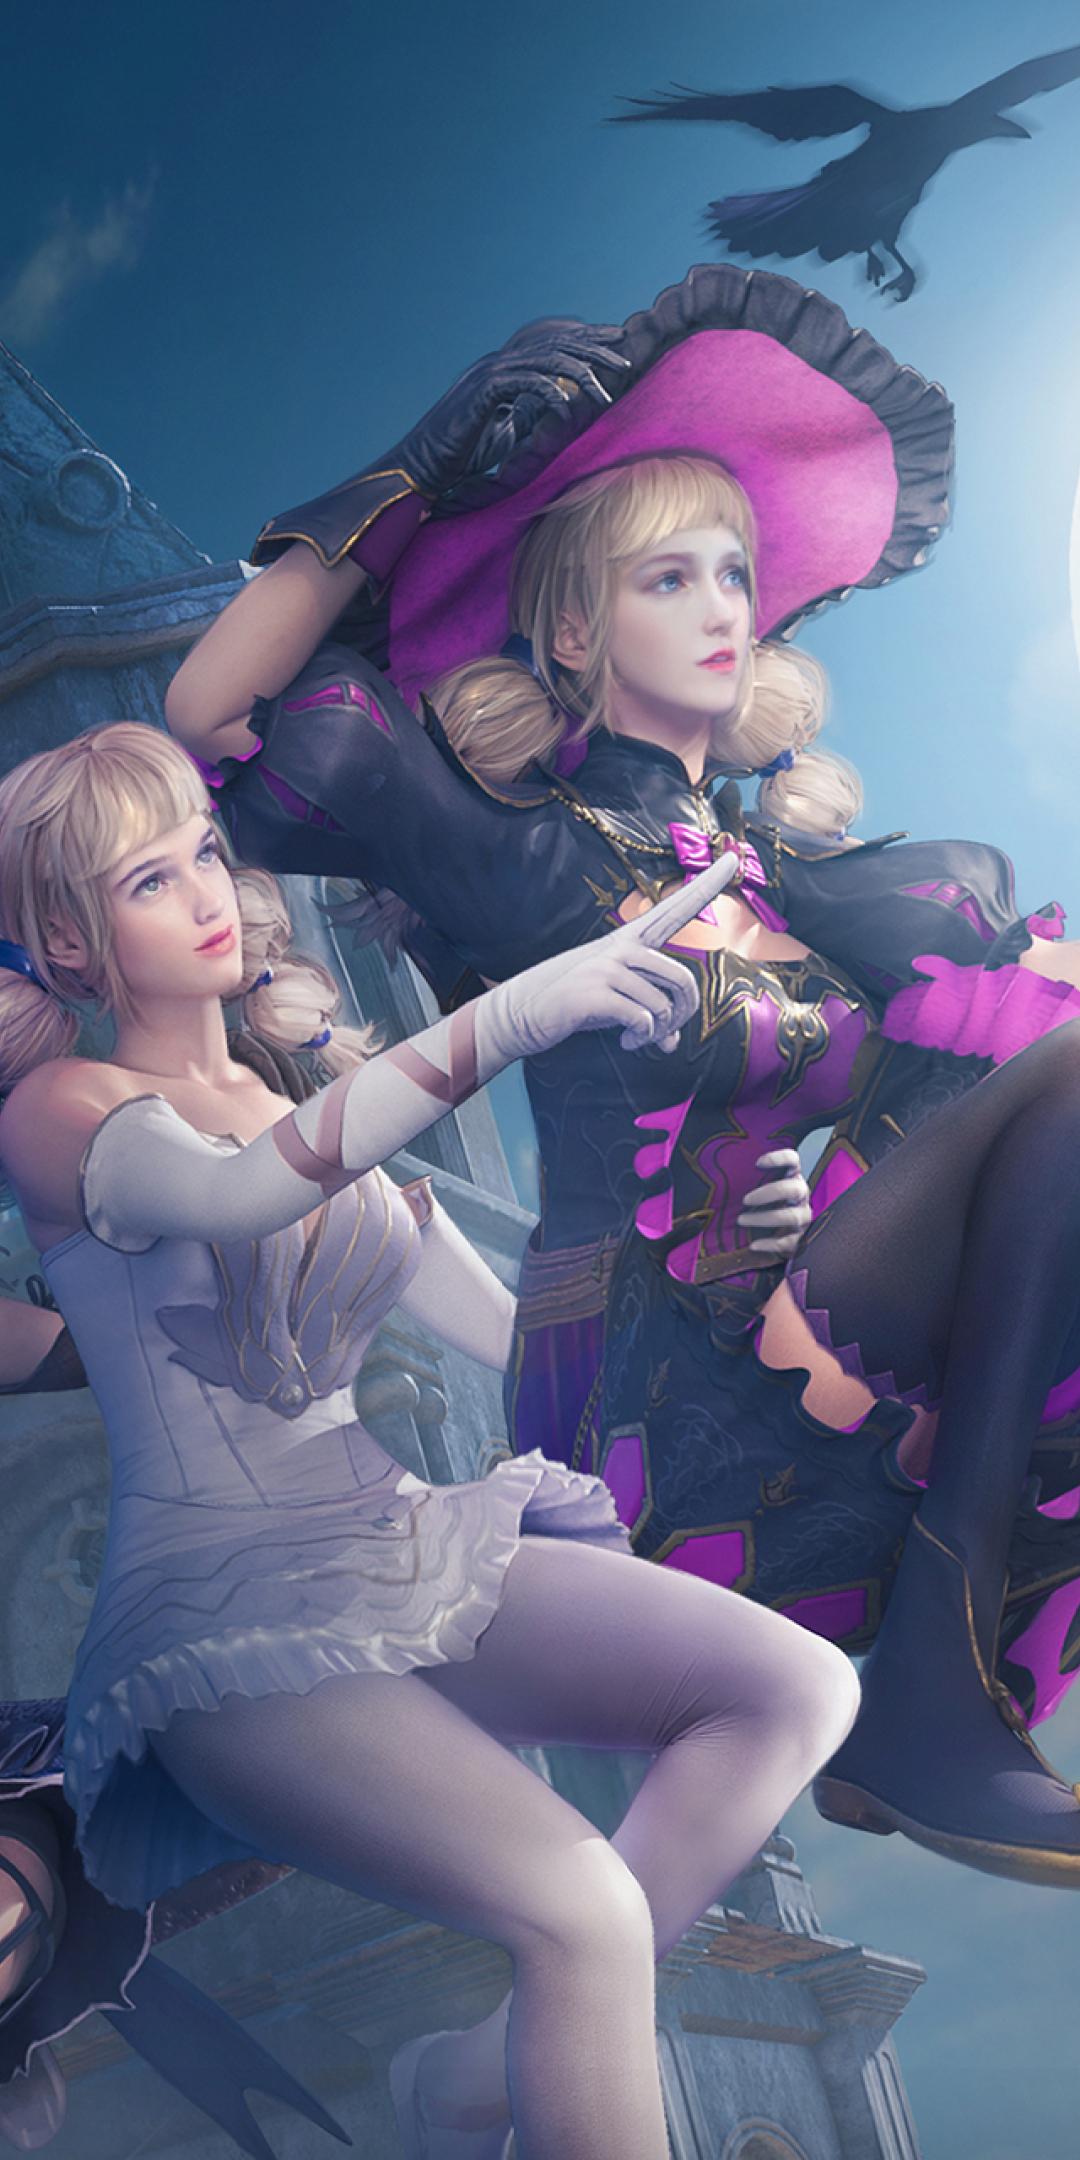 PUBG Halloween Fairy, Enchanter and Enchantress Wallpaper in 1080x2160 Resolution